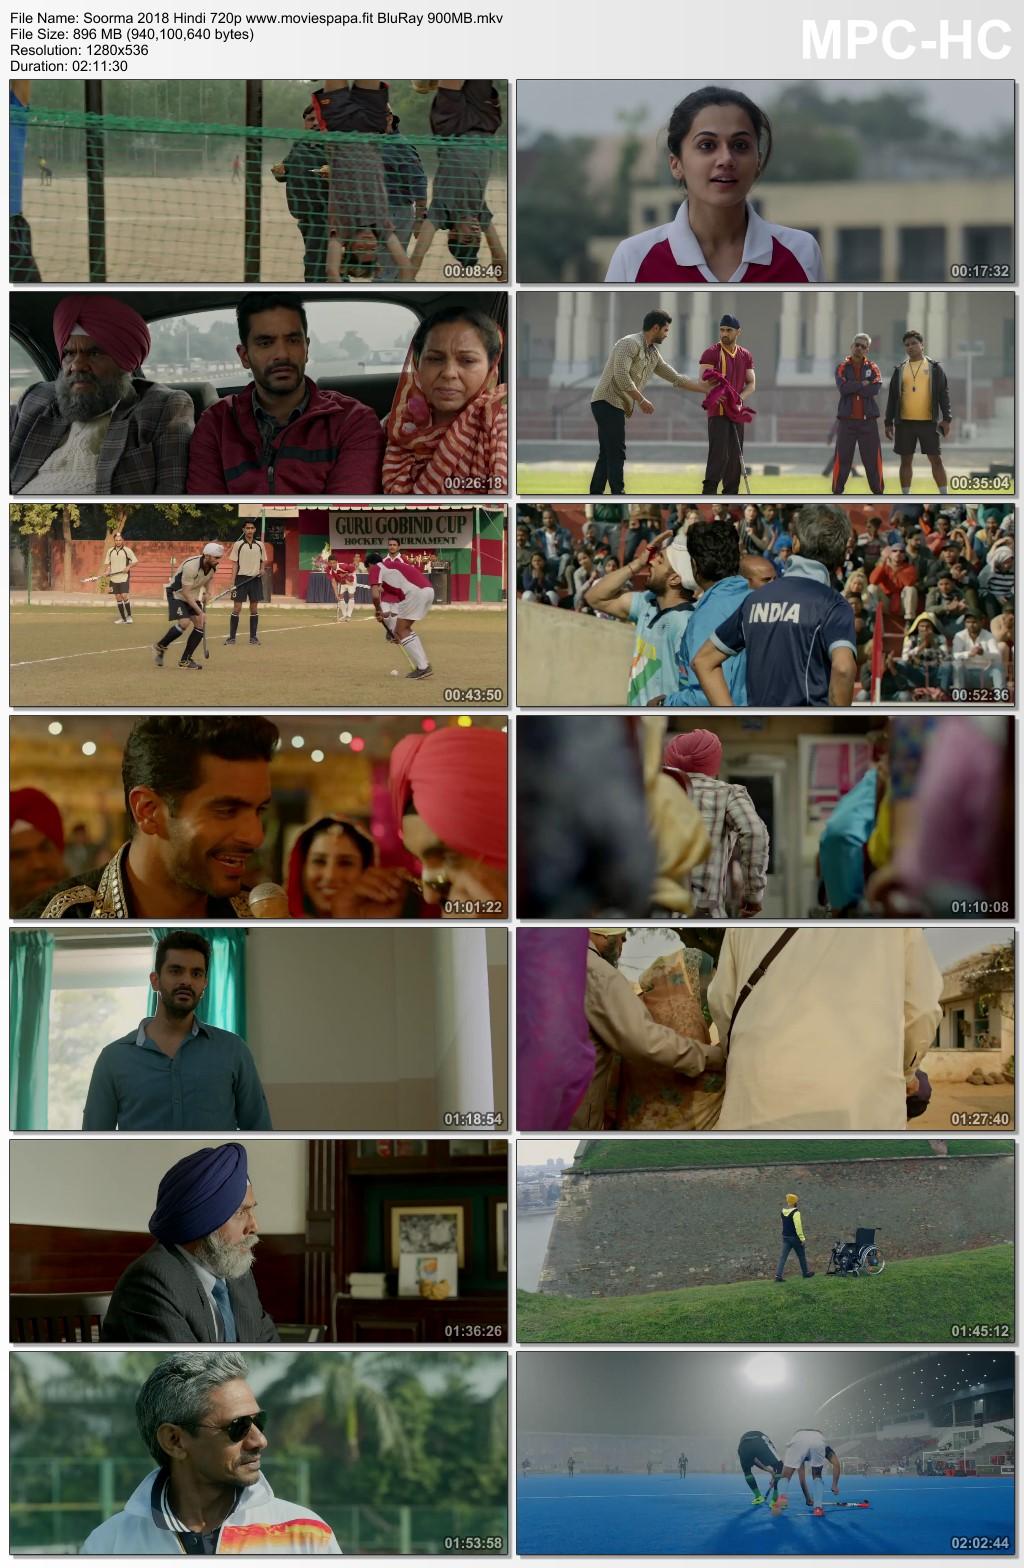 Soorma 2018 Hindi Movie 720p BluRay 950MB Download